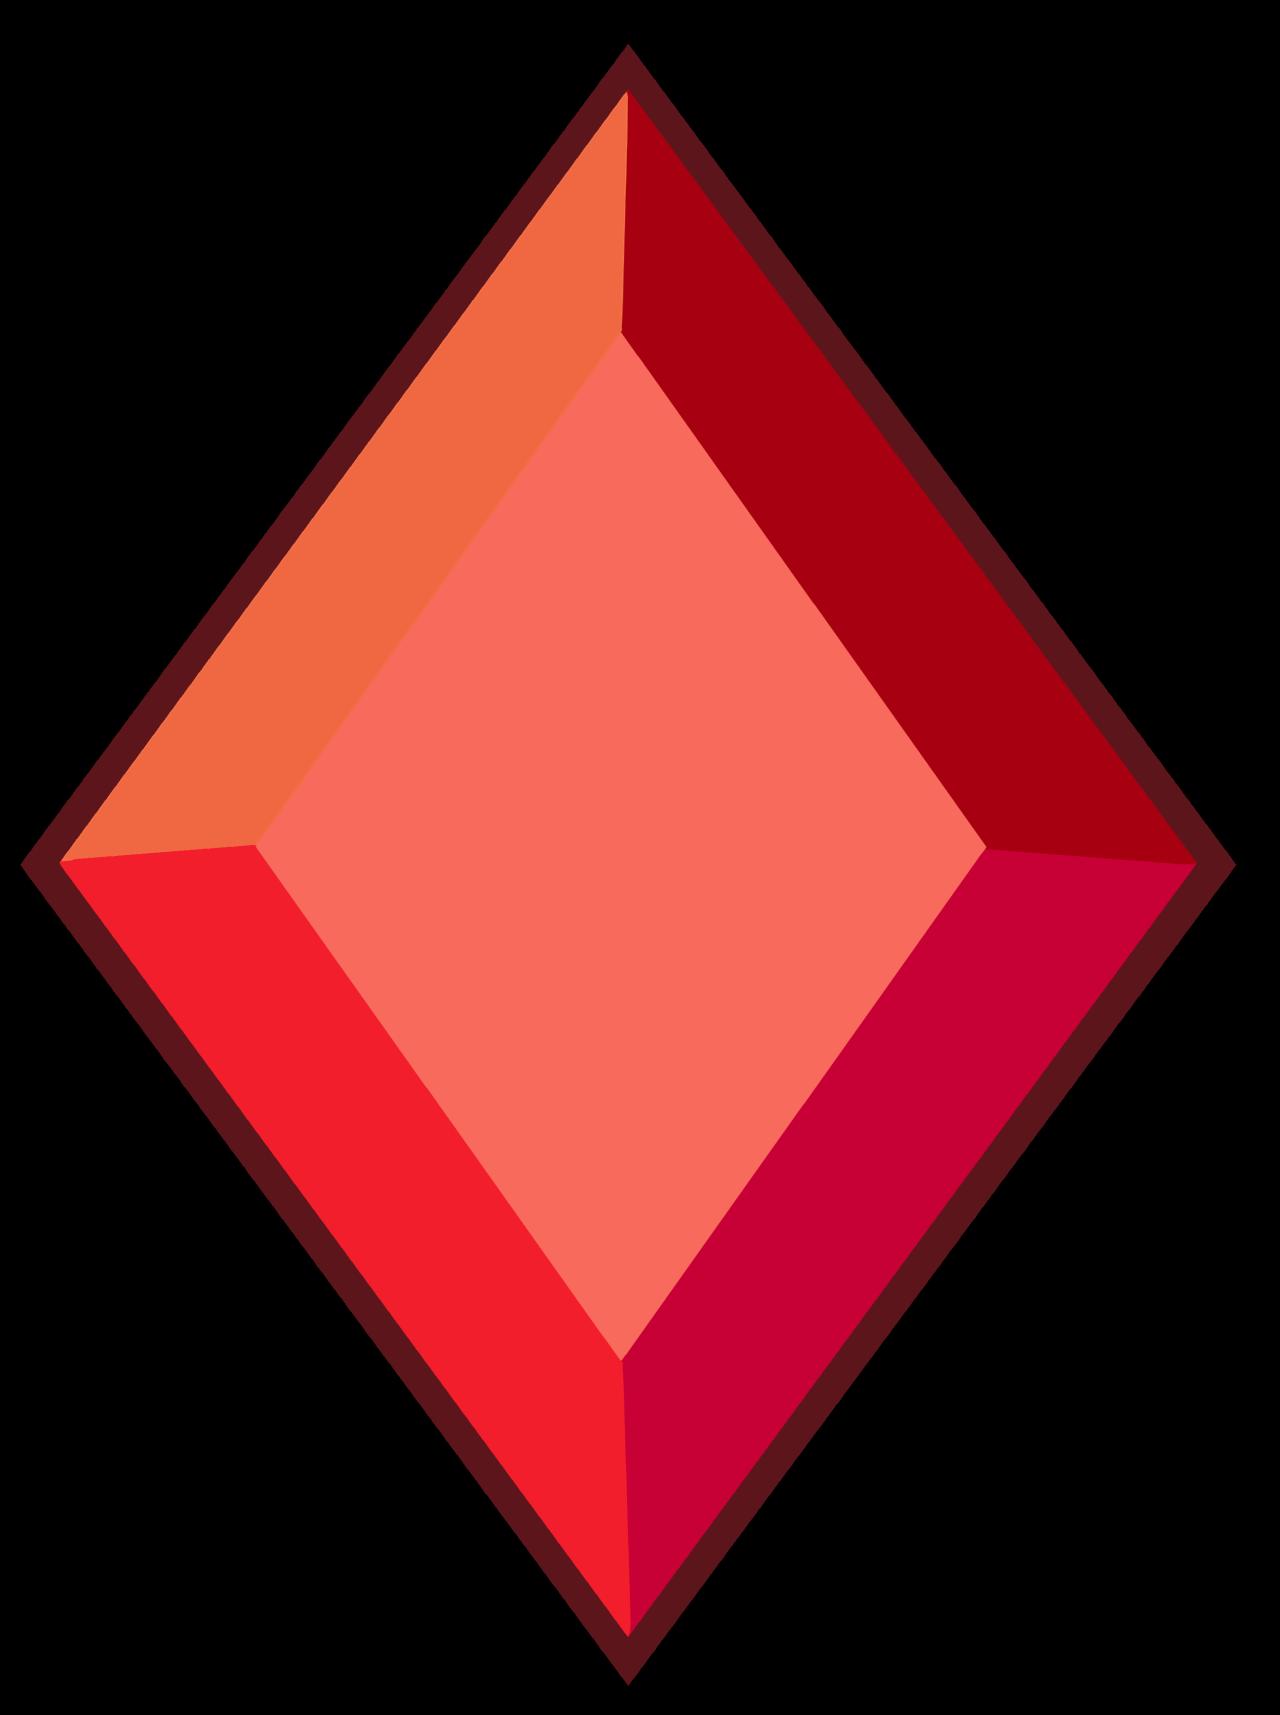 Diamond clipart red diamond Png Wikia FANDOM  Diamond